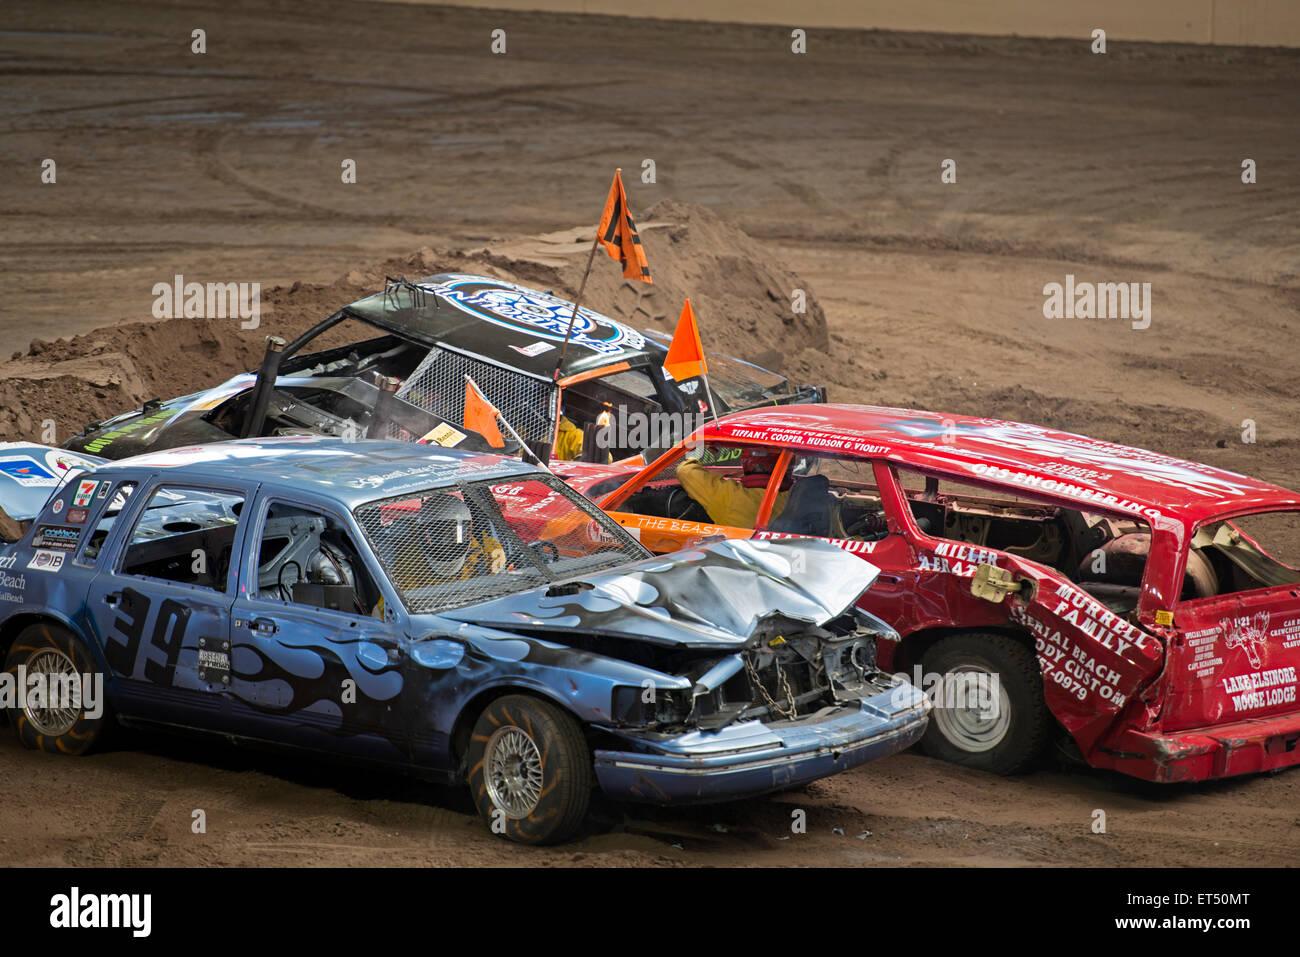 cars in demolition derby san diego county fair del mar. Black Bedroom Furniture Sets. Home Design Ideas